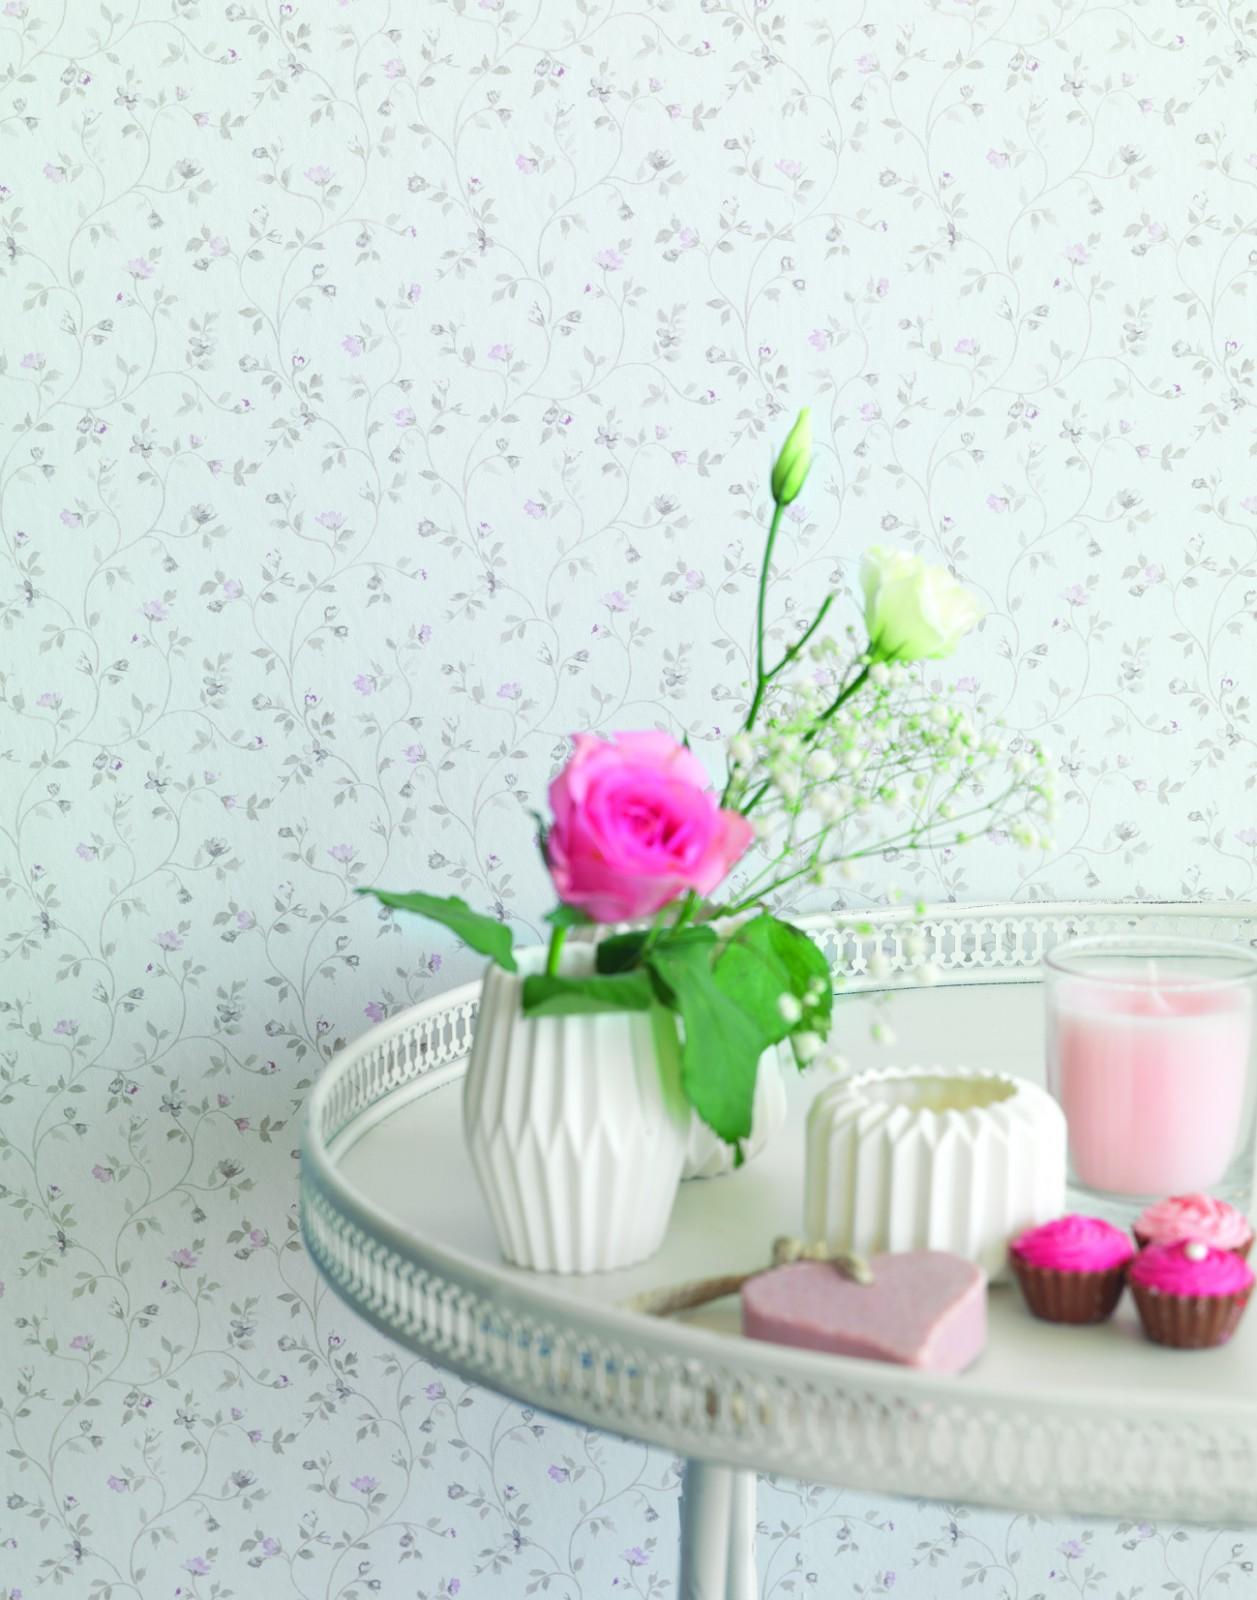 tapete grau blau blumen petite fleur rasch 285290. Black Bedroom Furniture Sets. Home Design Ideas